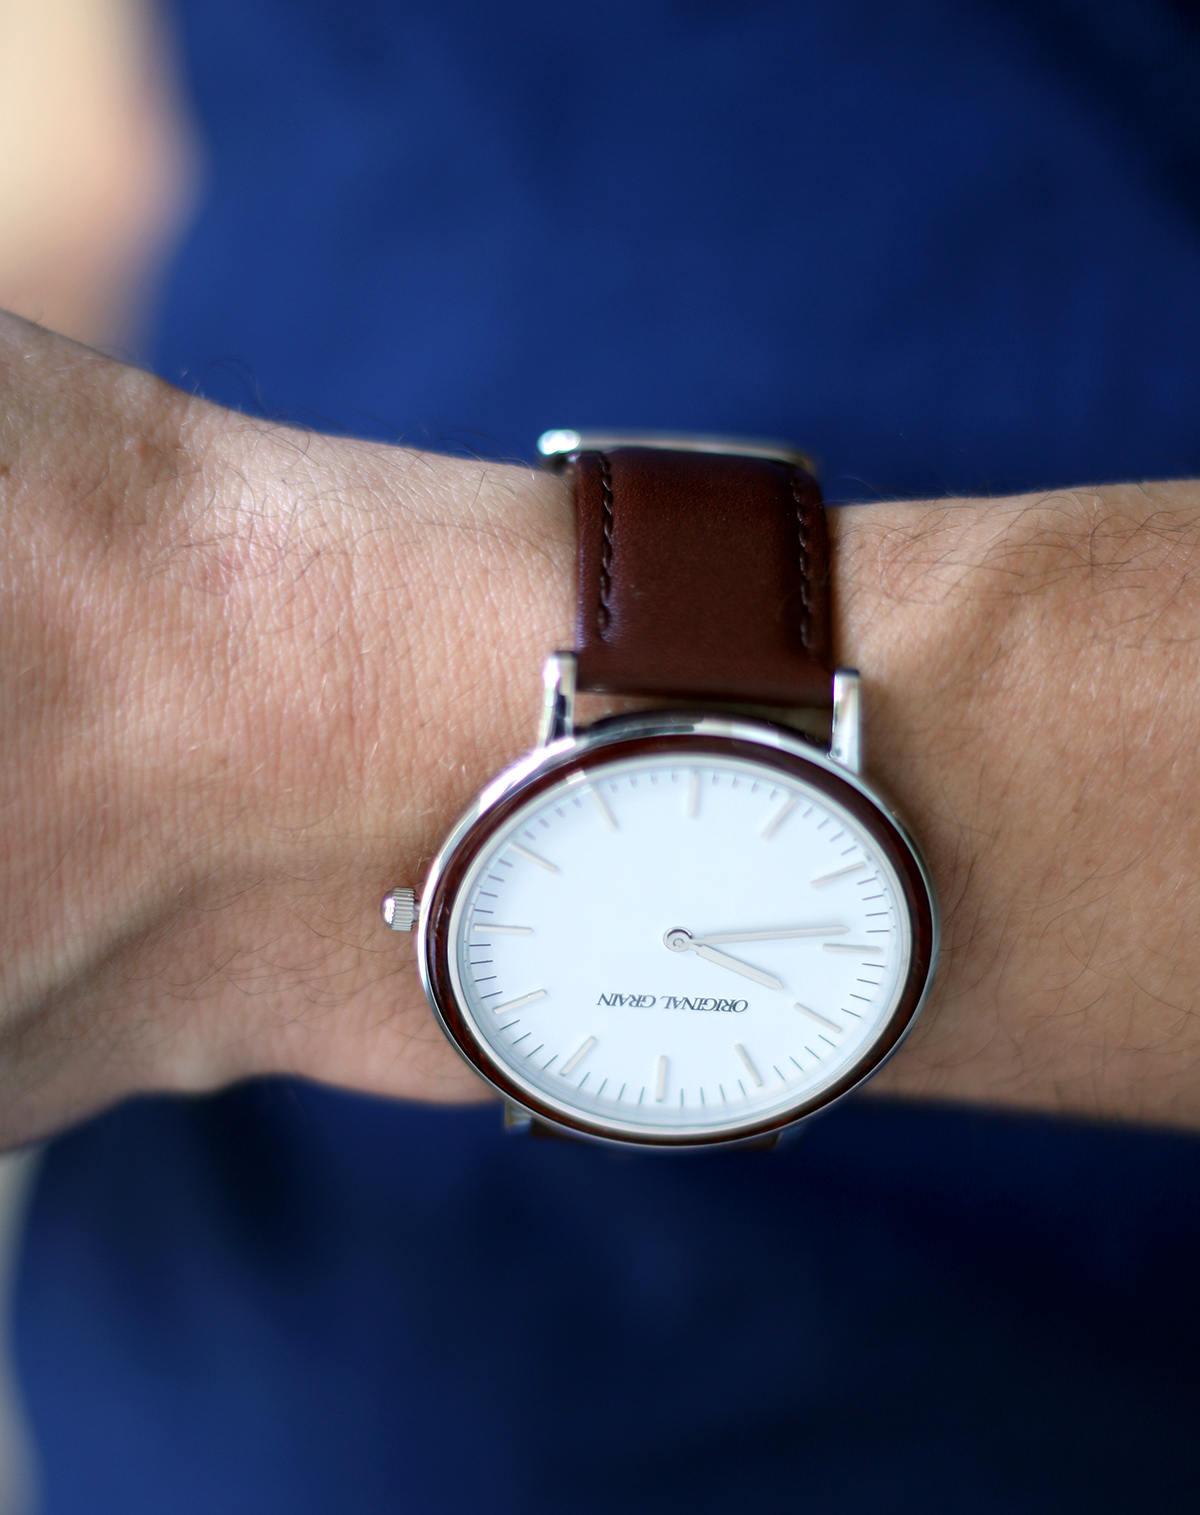 OG minimalist watch